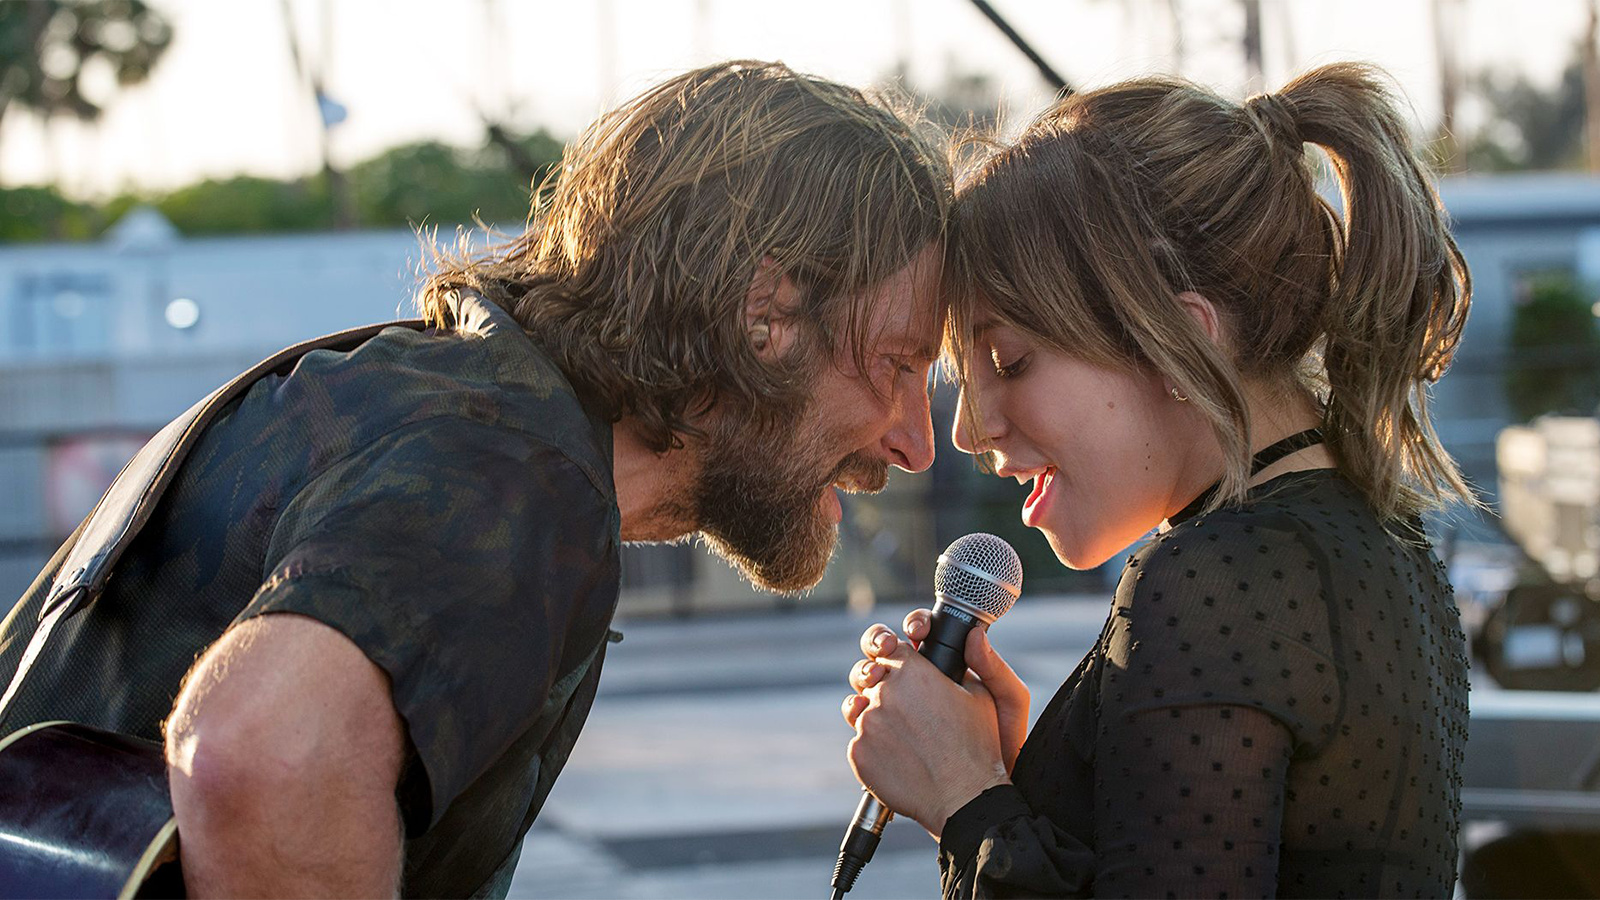 O filme, protagonizado por Lady Gaga e Bradley Cooper, está previsto para estrear dia 11 de outubro.